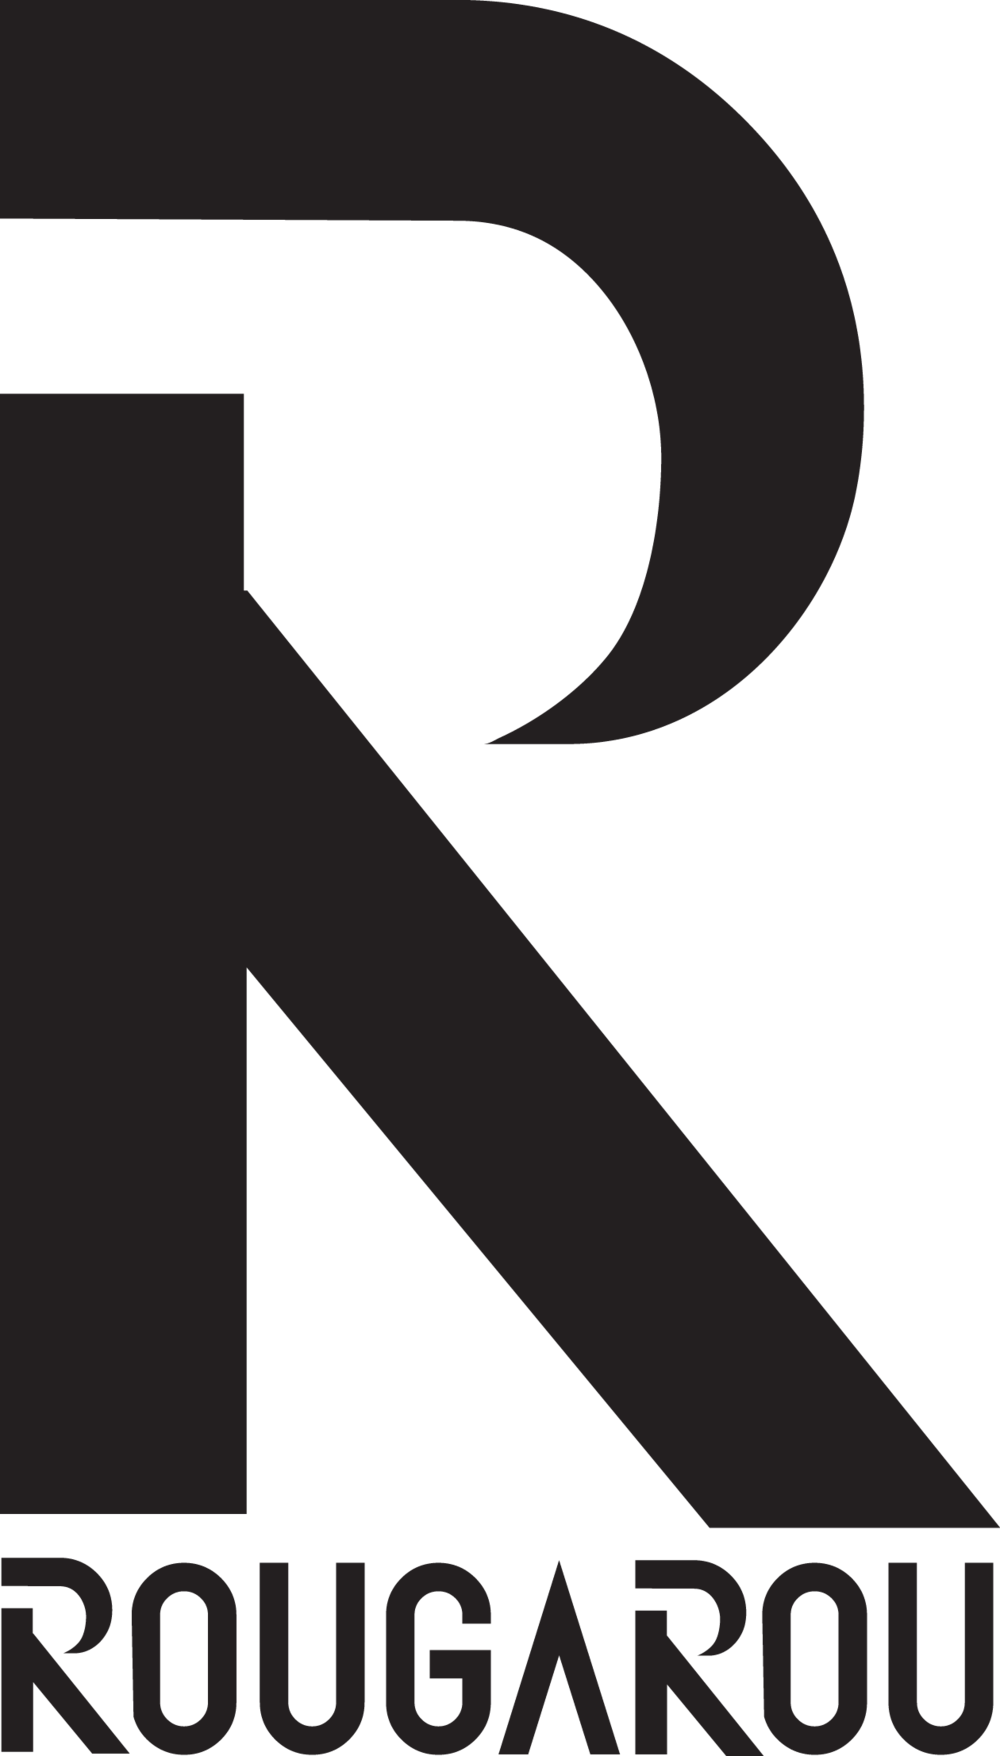 rougarou_letter.png